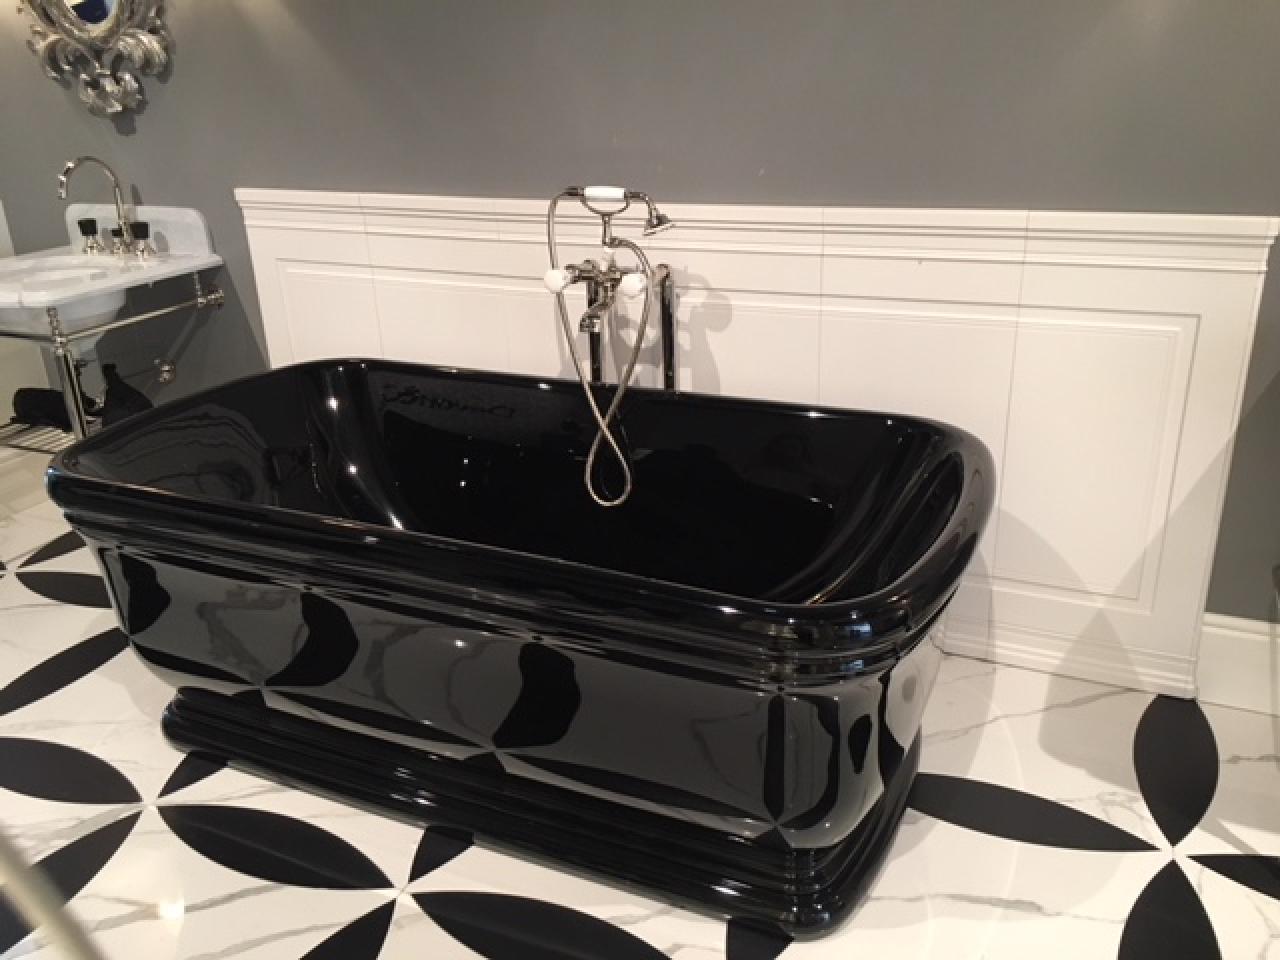 Vasca Da Bagno Nera Prezzi : La vasca da bagno a vicenza fratelli pellizzari